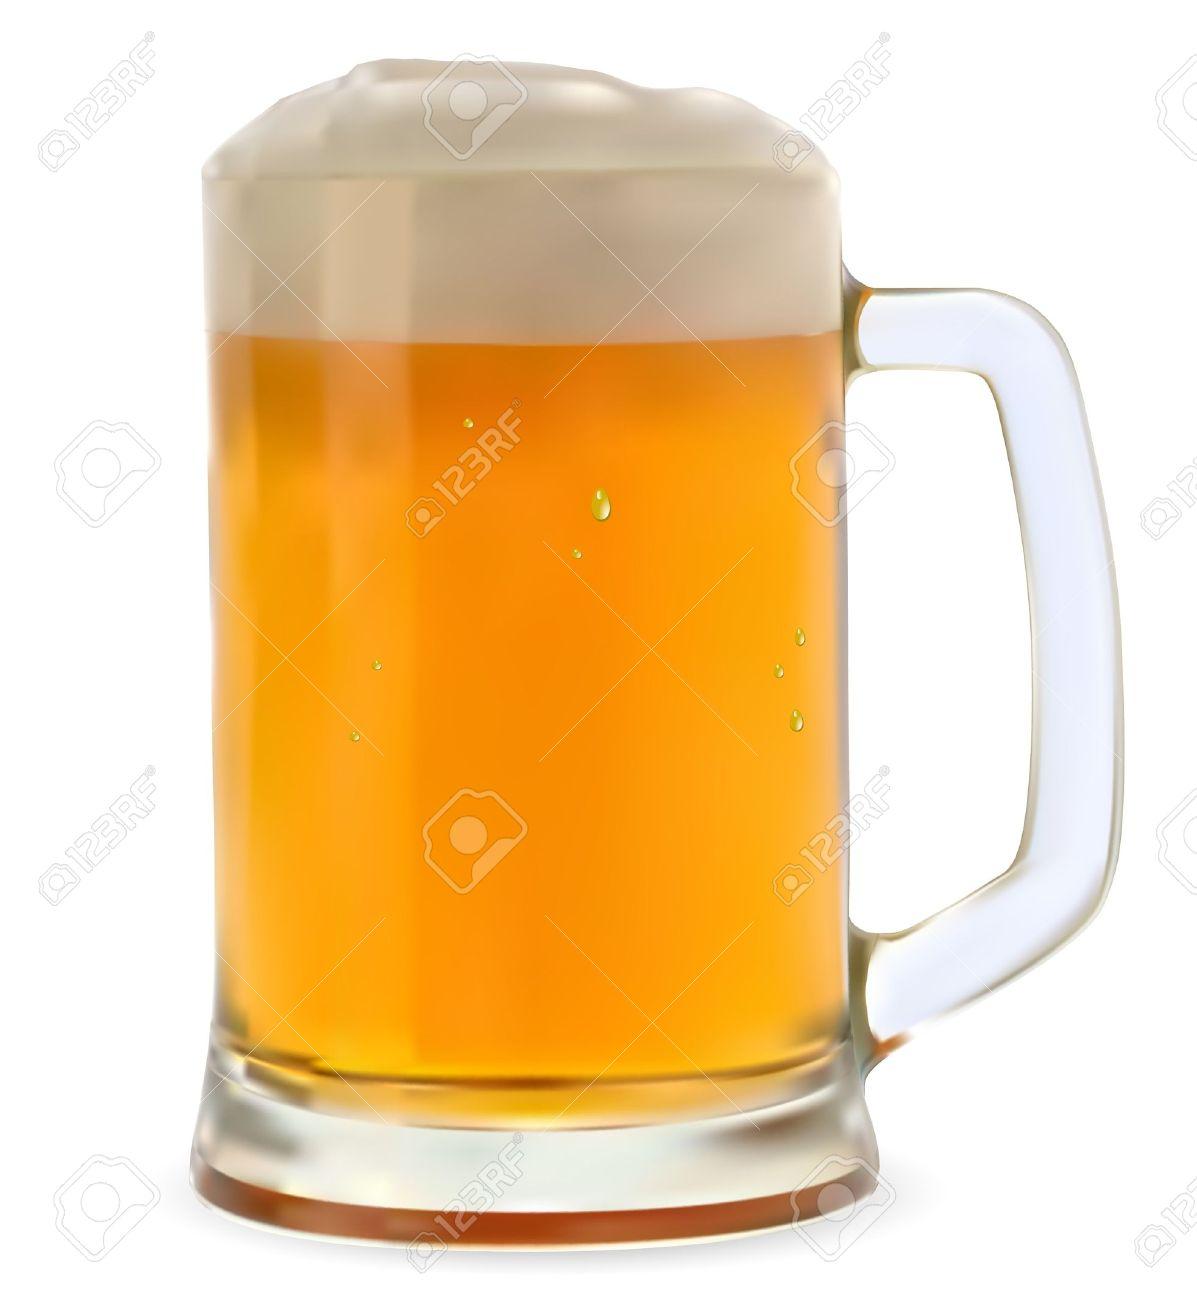 Mug of beer on a white background - 13738968